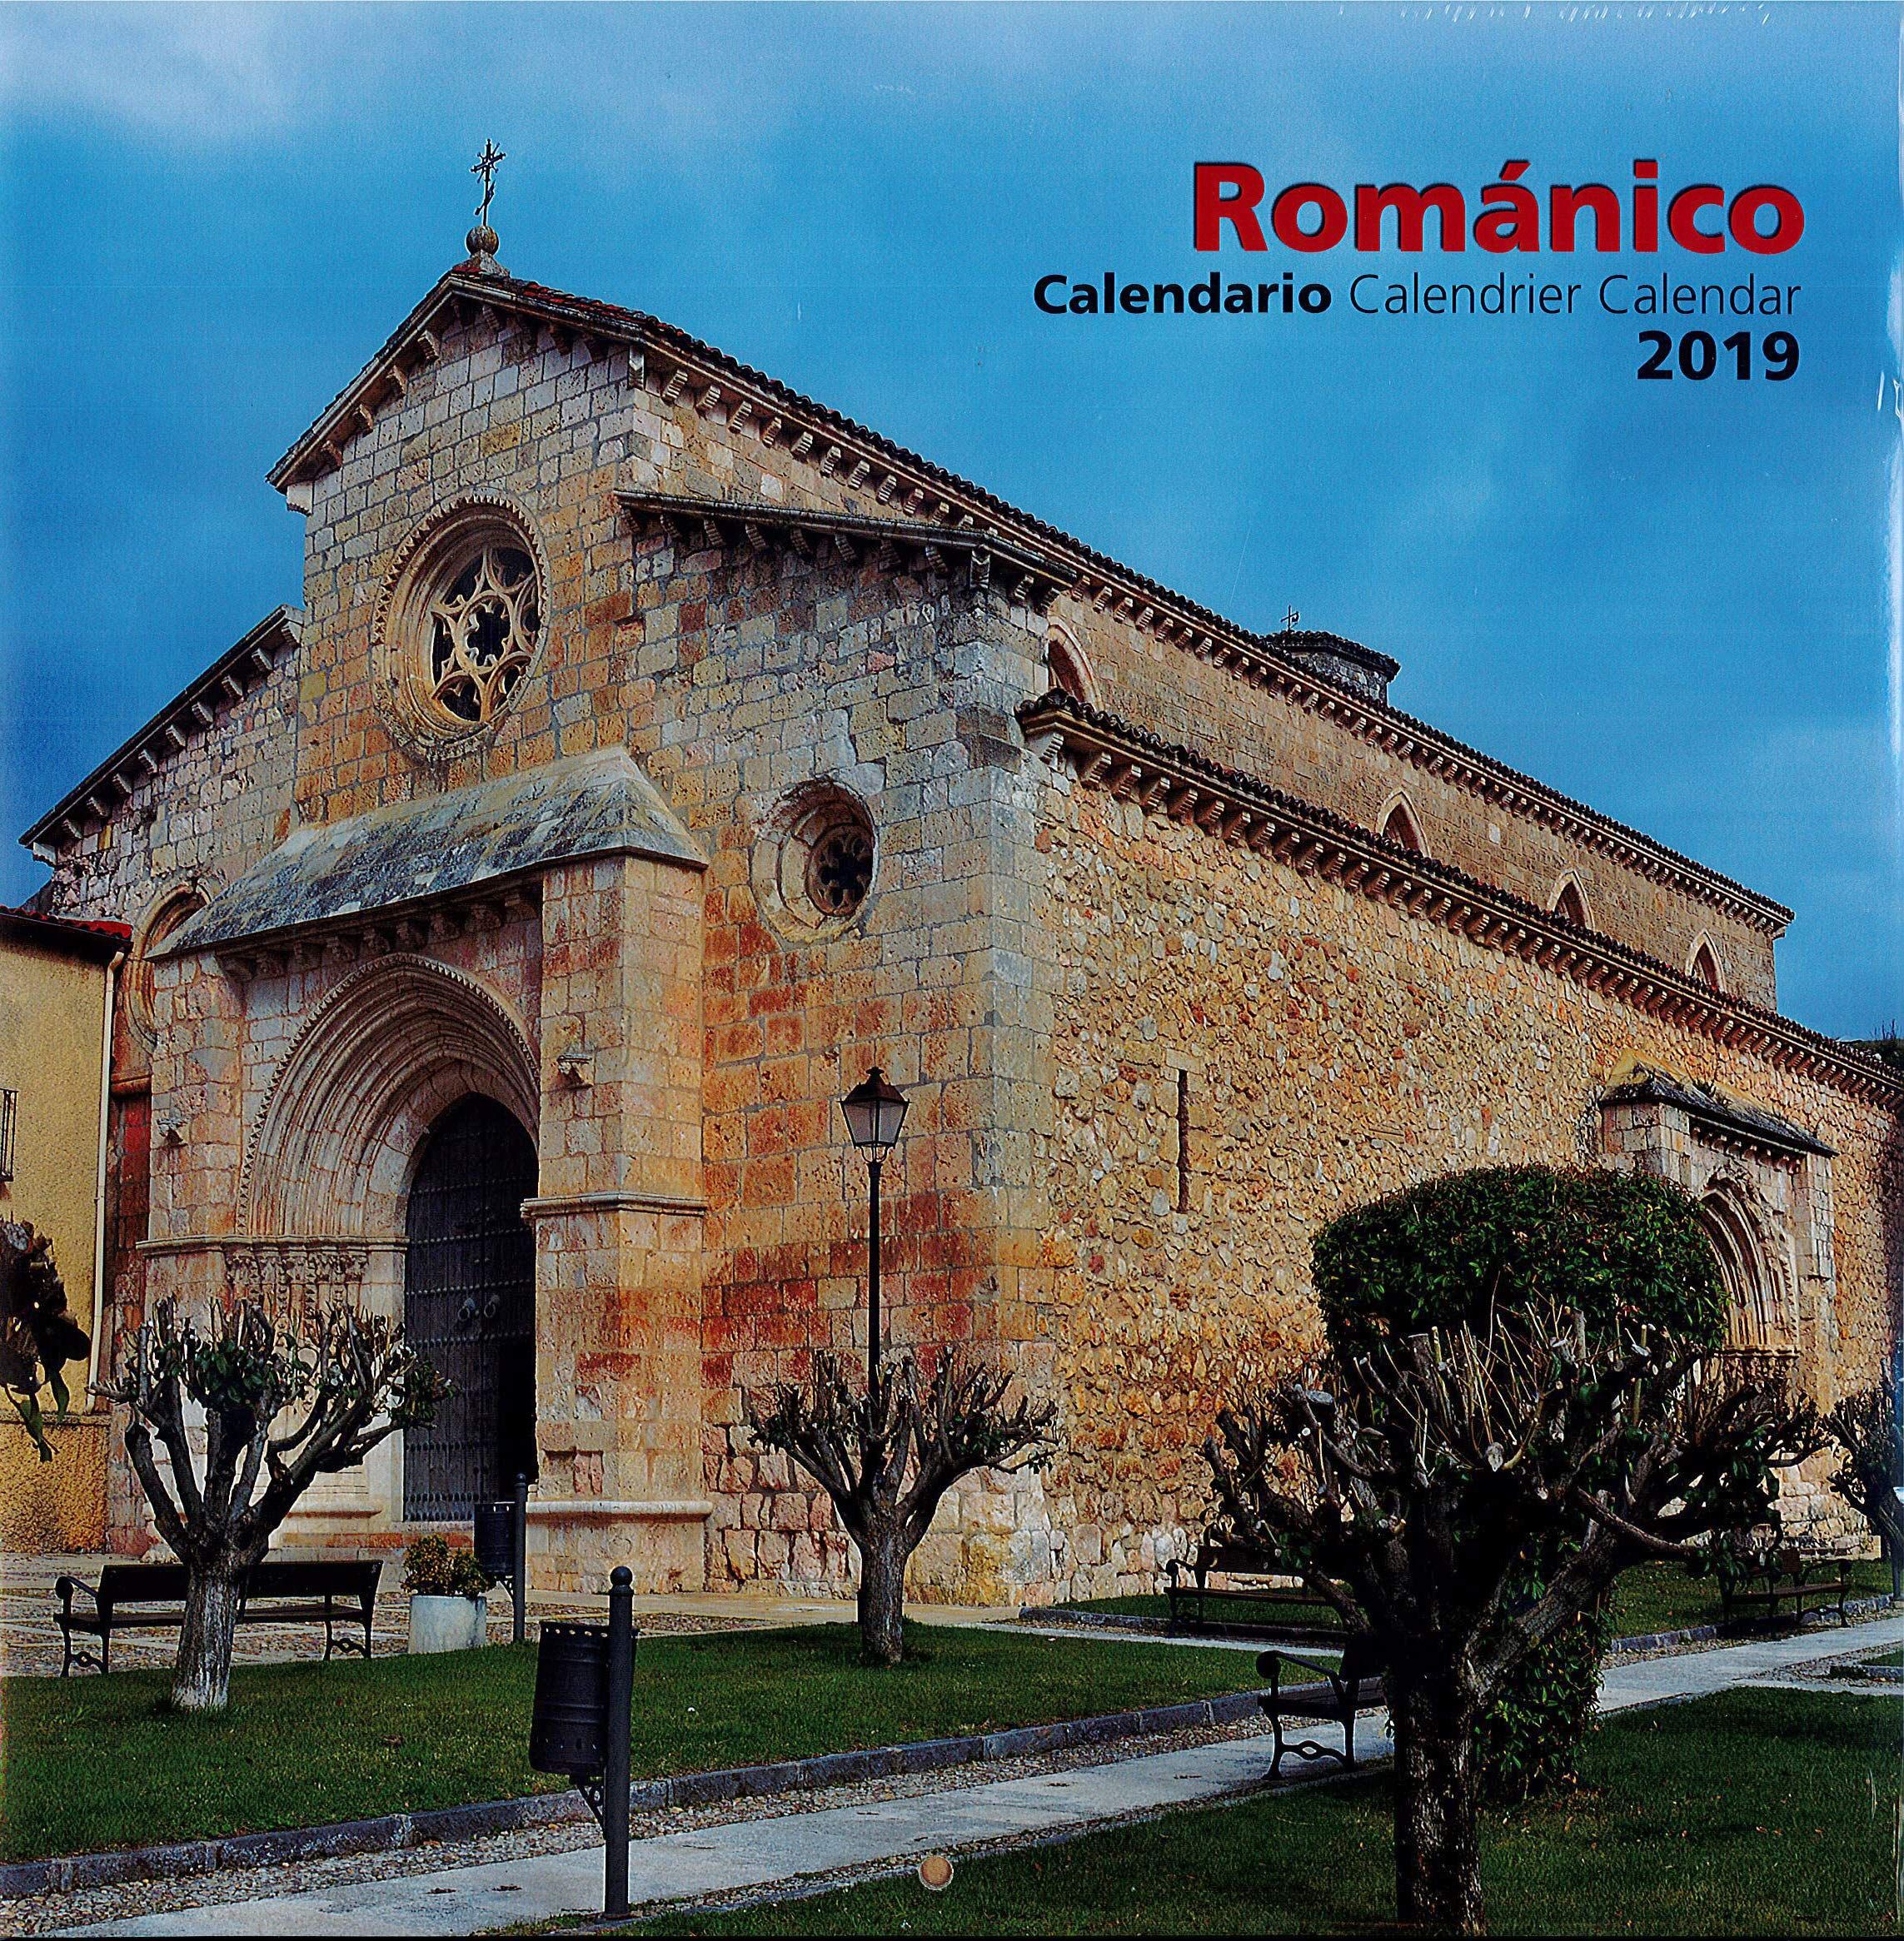 Caledario Románico 2019 pared Tapa blanda – 11 sep 2018 Ediciones Mensajero 842714153X GBCY EDUCATION / General